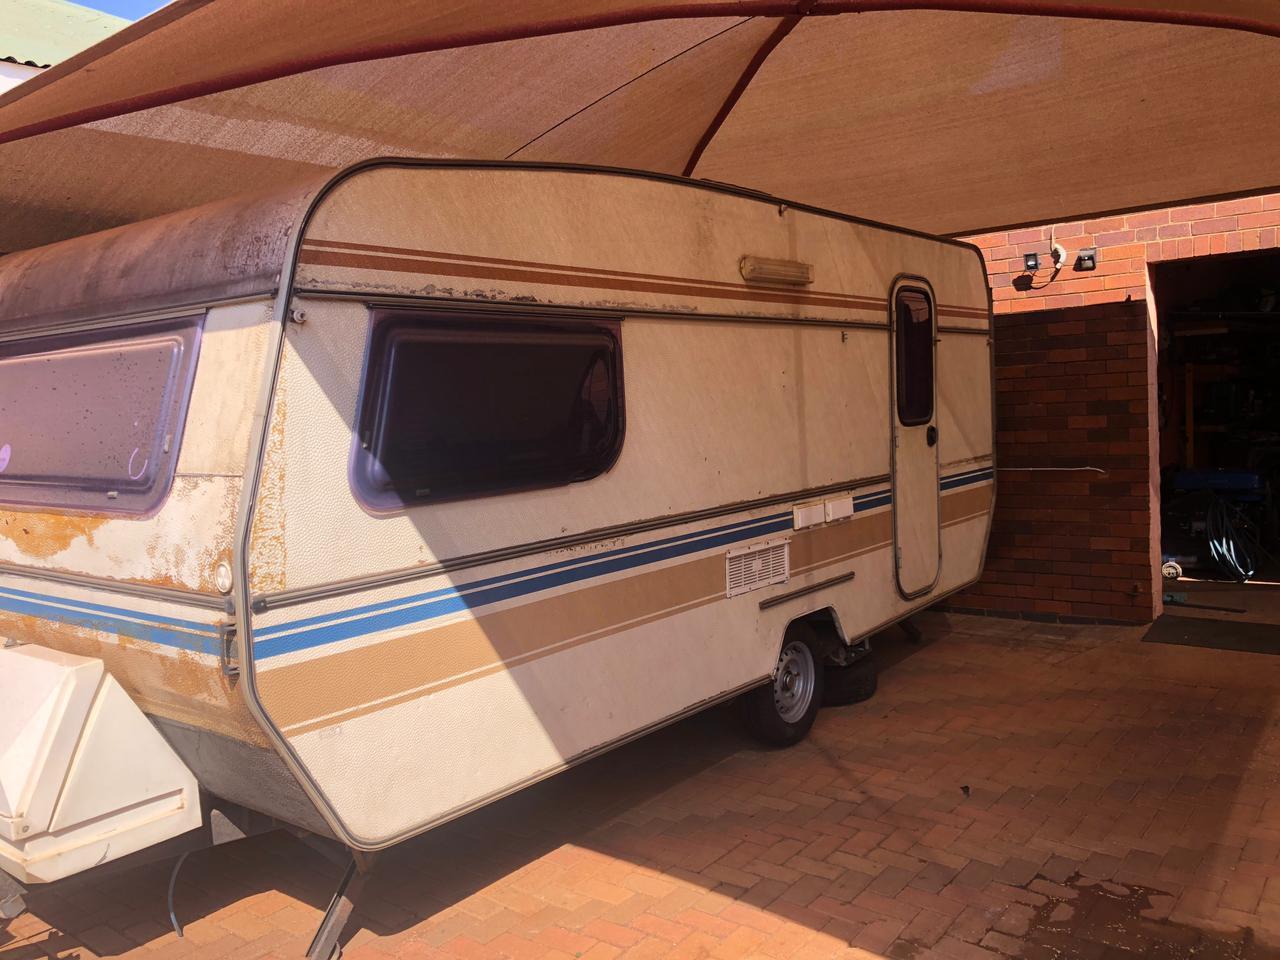 Selling Sprite CI Caravan, 1984 model.